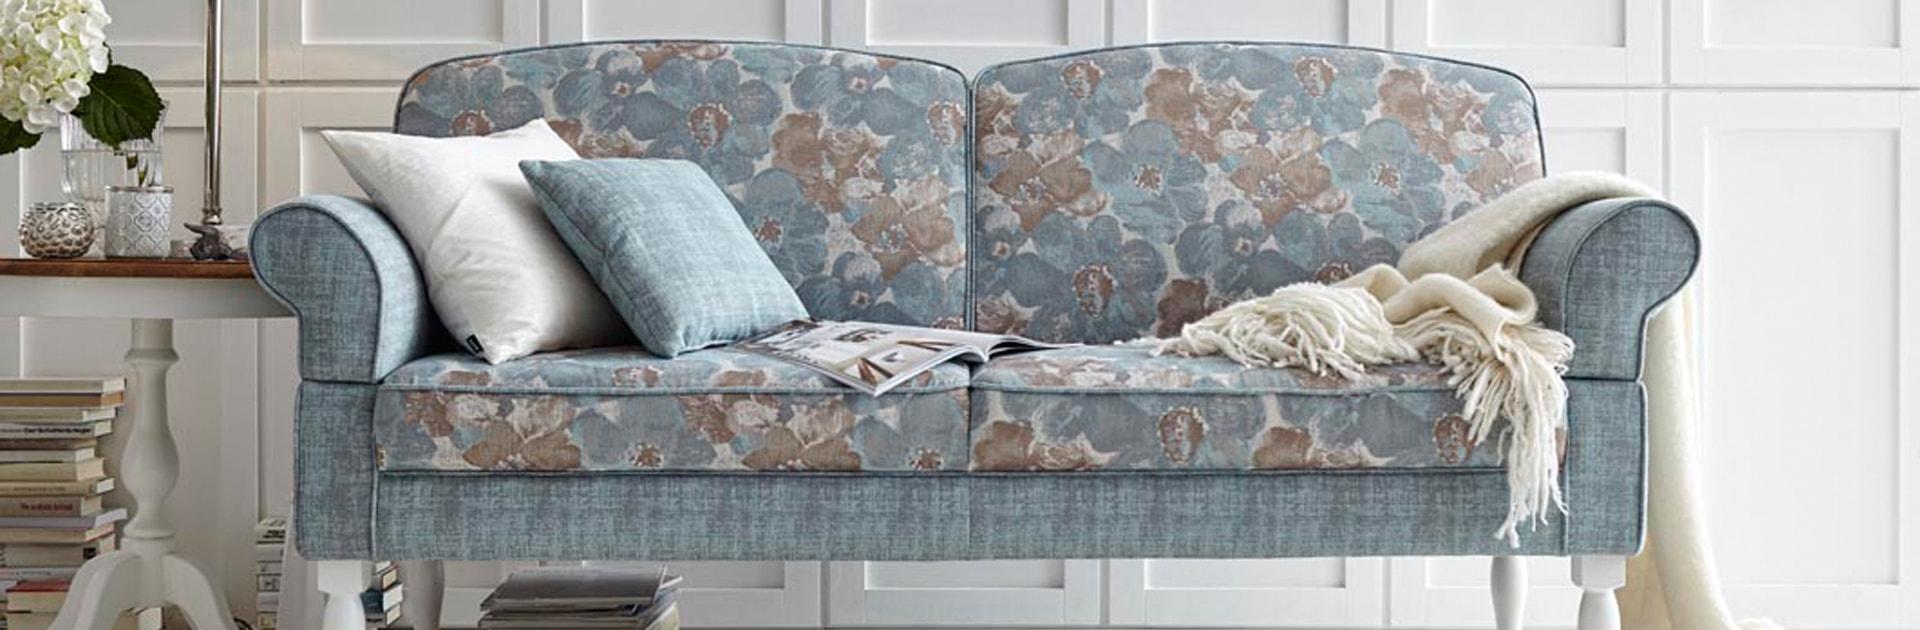 Full Size of Natura Couch Brooklyn Sofa Kansas Love Newport Kaufen Denver Pasadena Gebraucht Livingston Home Rund Inhofer Ektorp Brühl Weiß Grau Big Günstig Große Sofa Natura Sofa